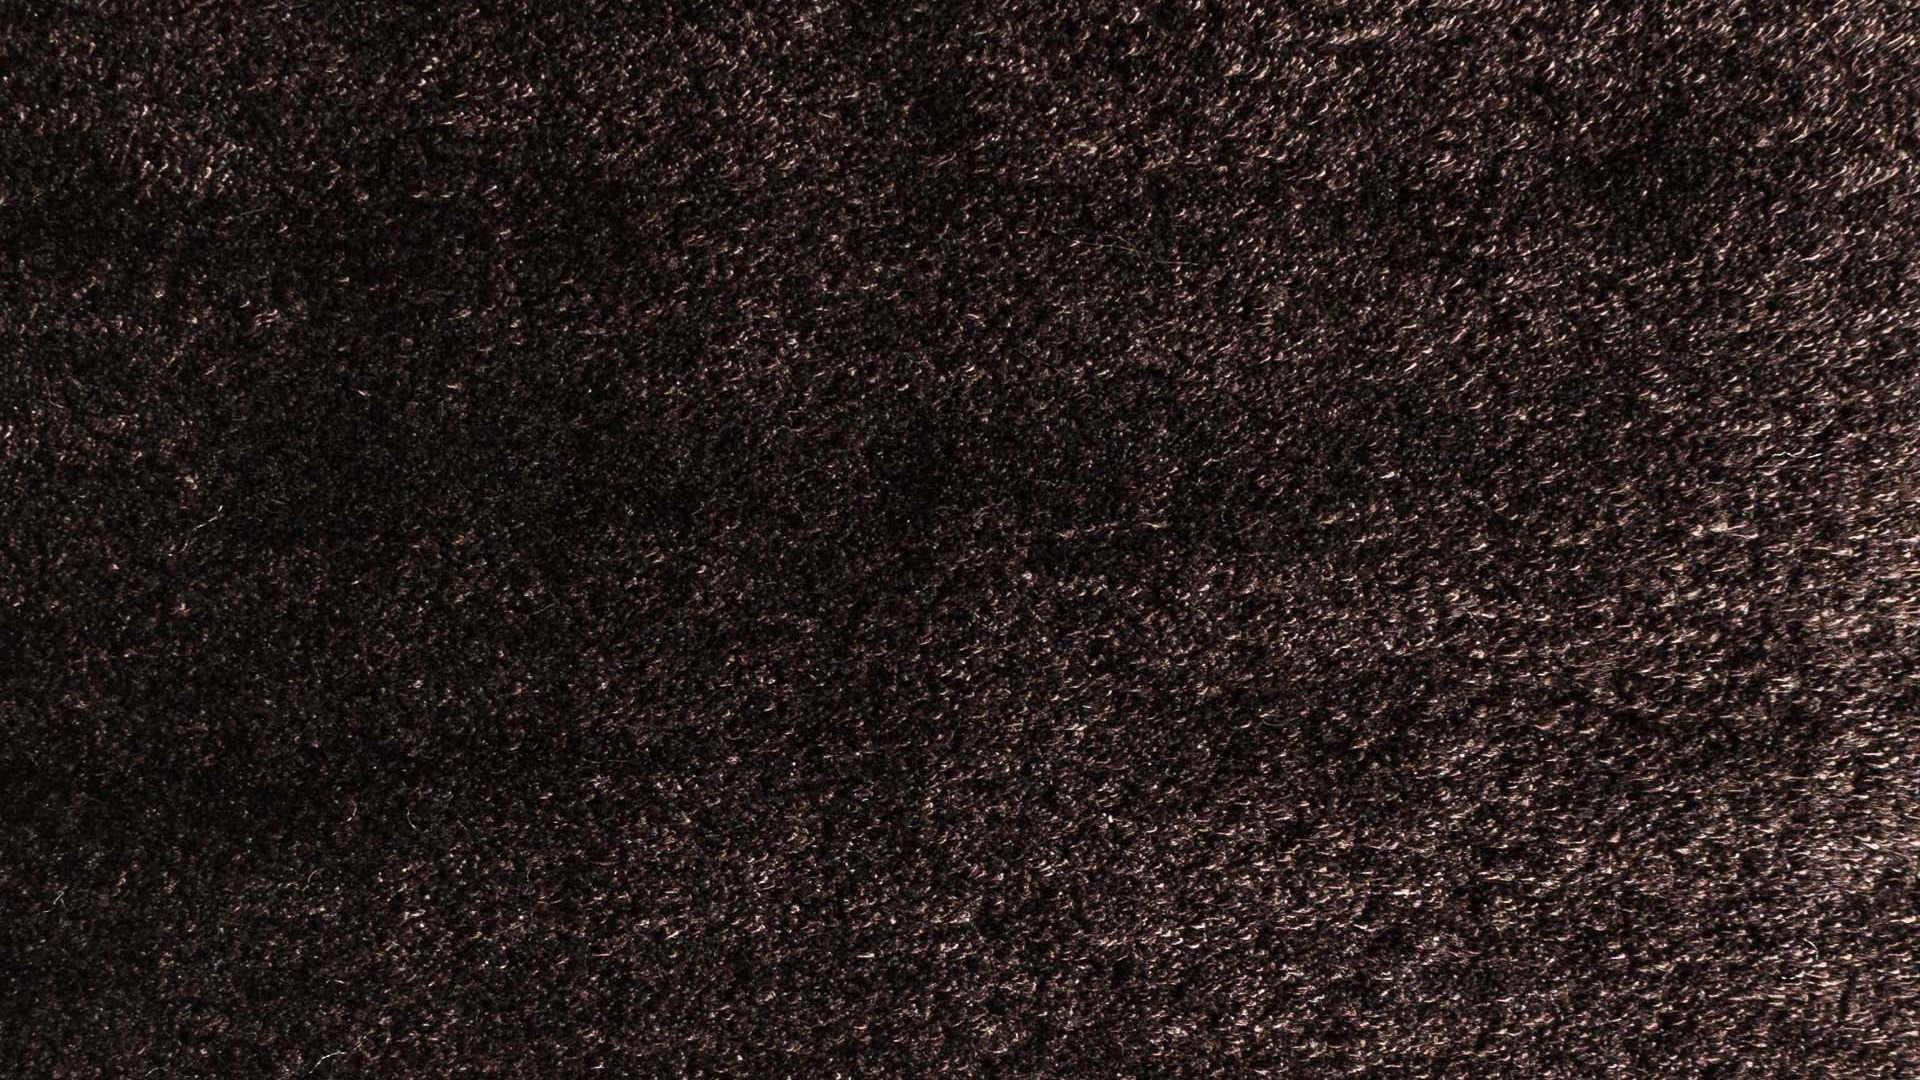 miami-dm-06-18mm.jpg